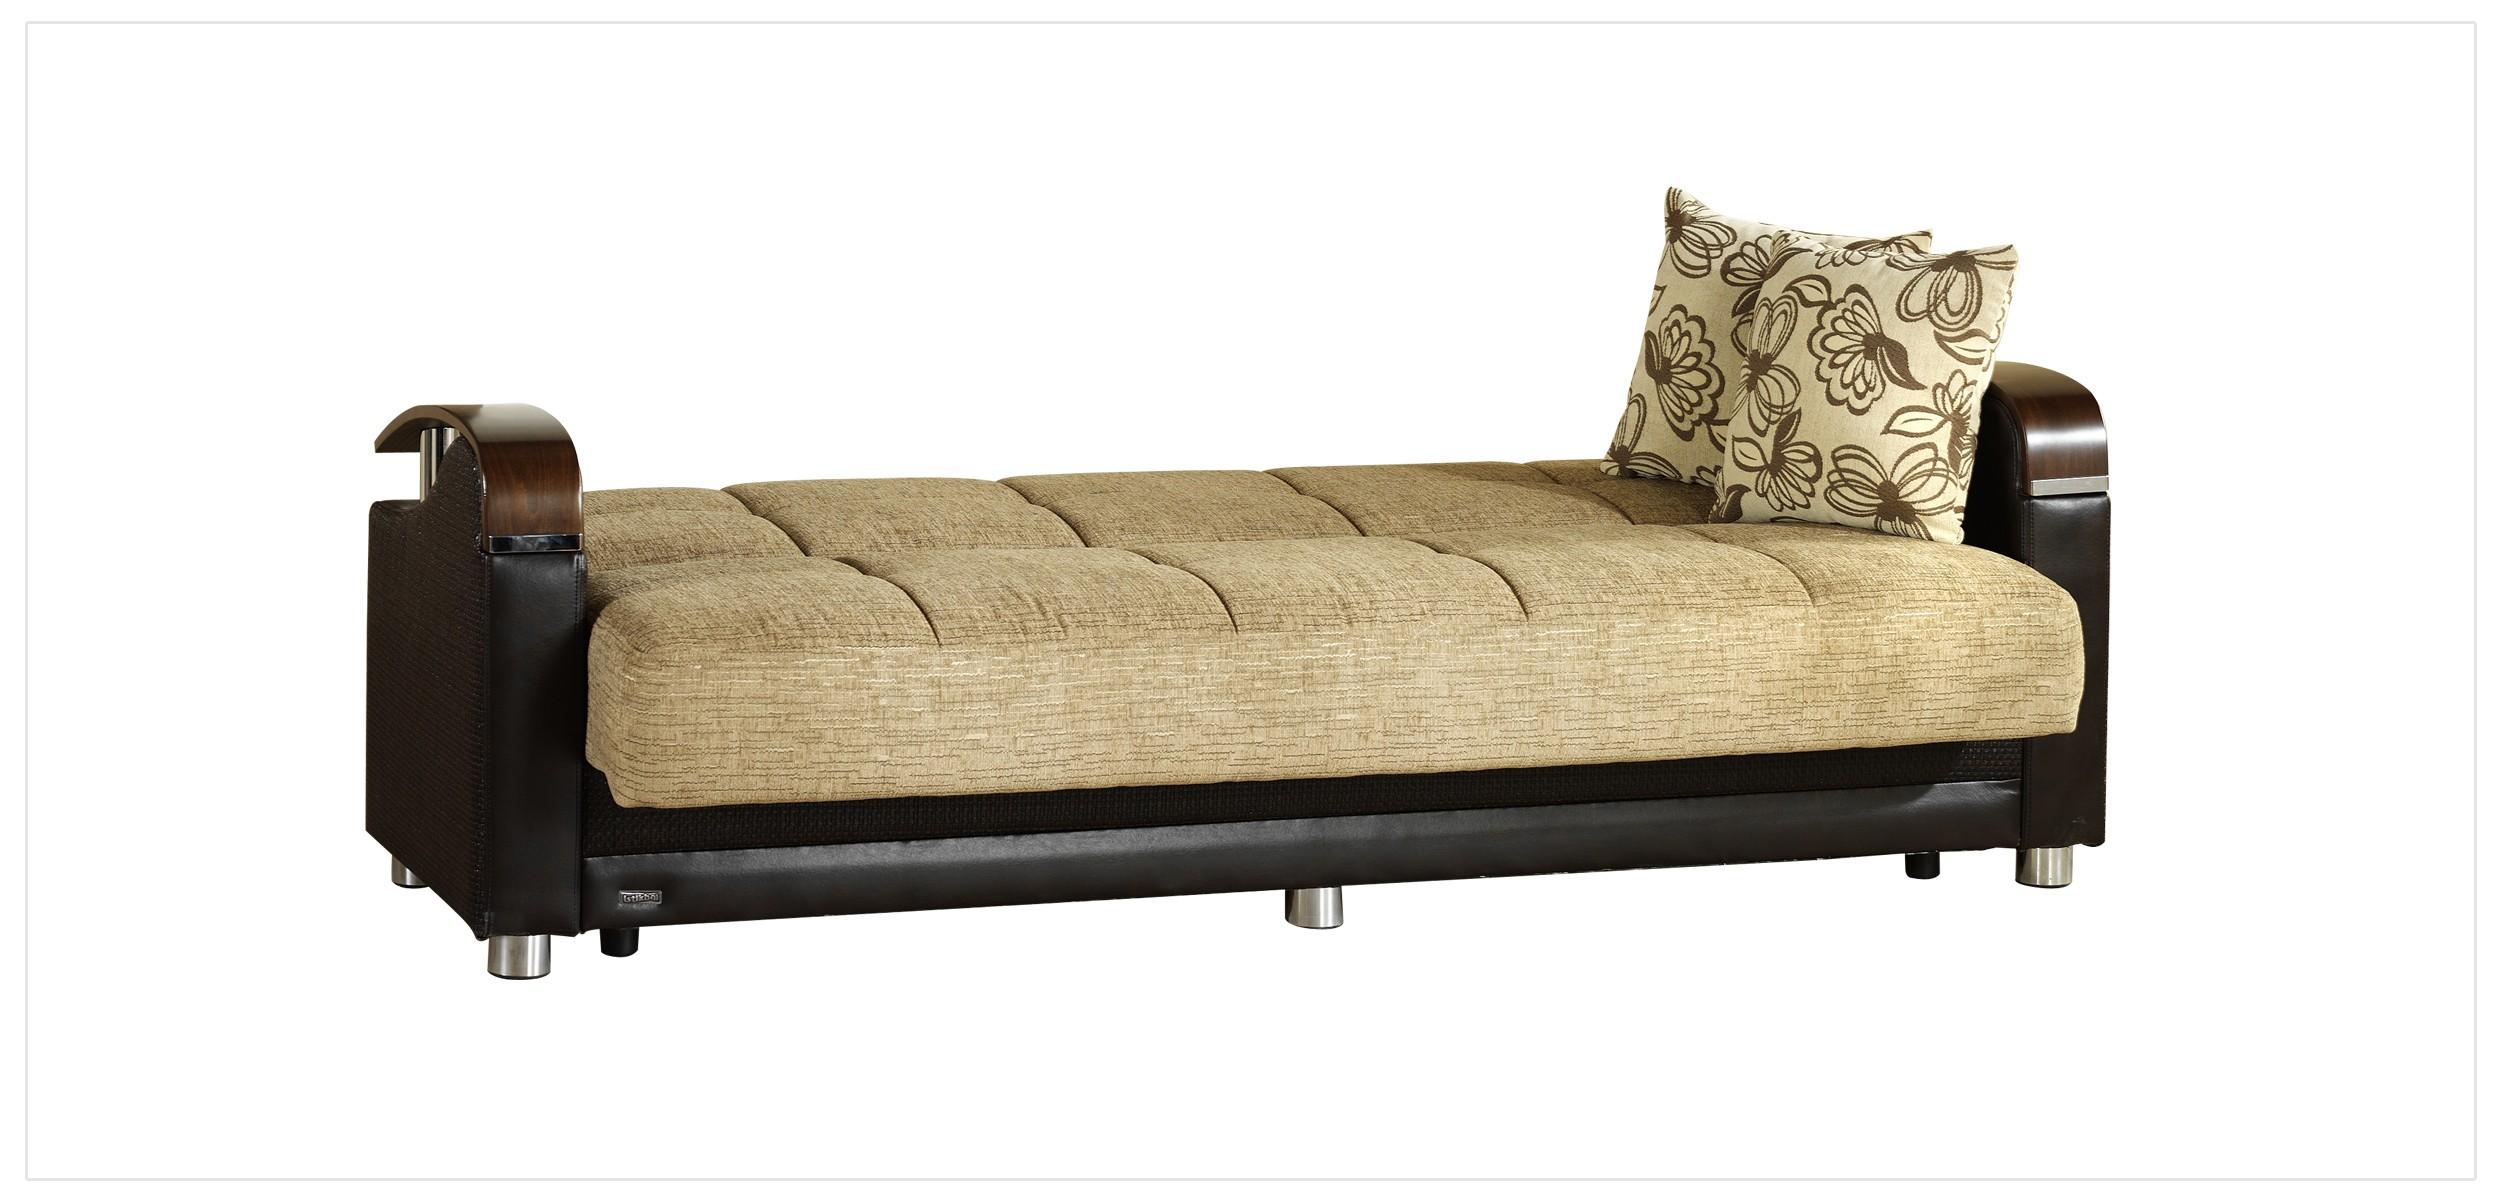 Luna Fulya Brown Convertible Sofa Bed With Storage